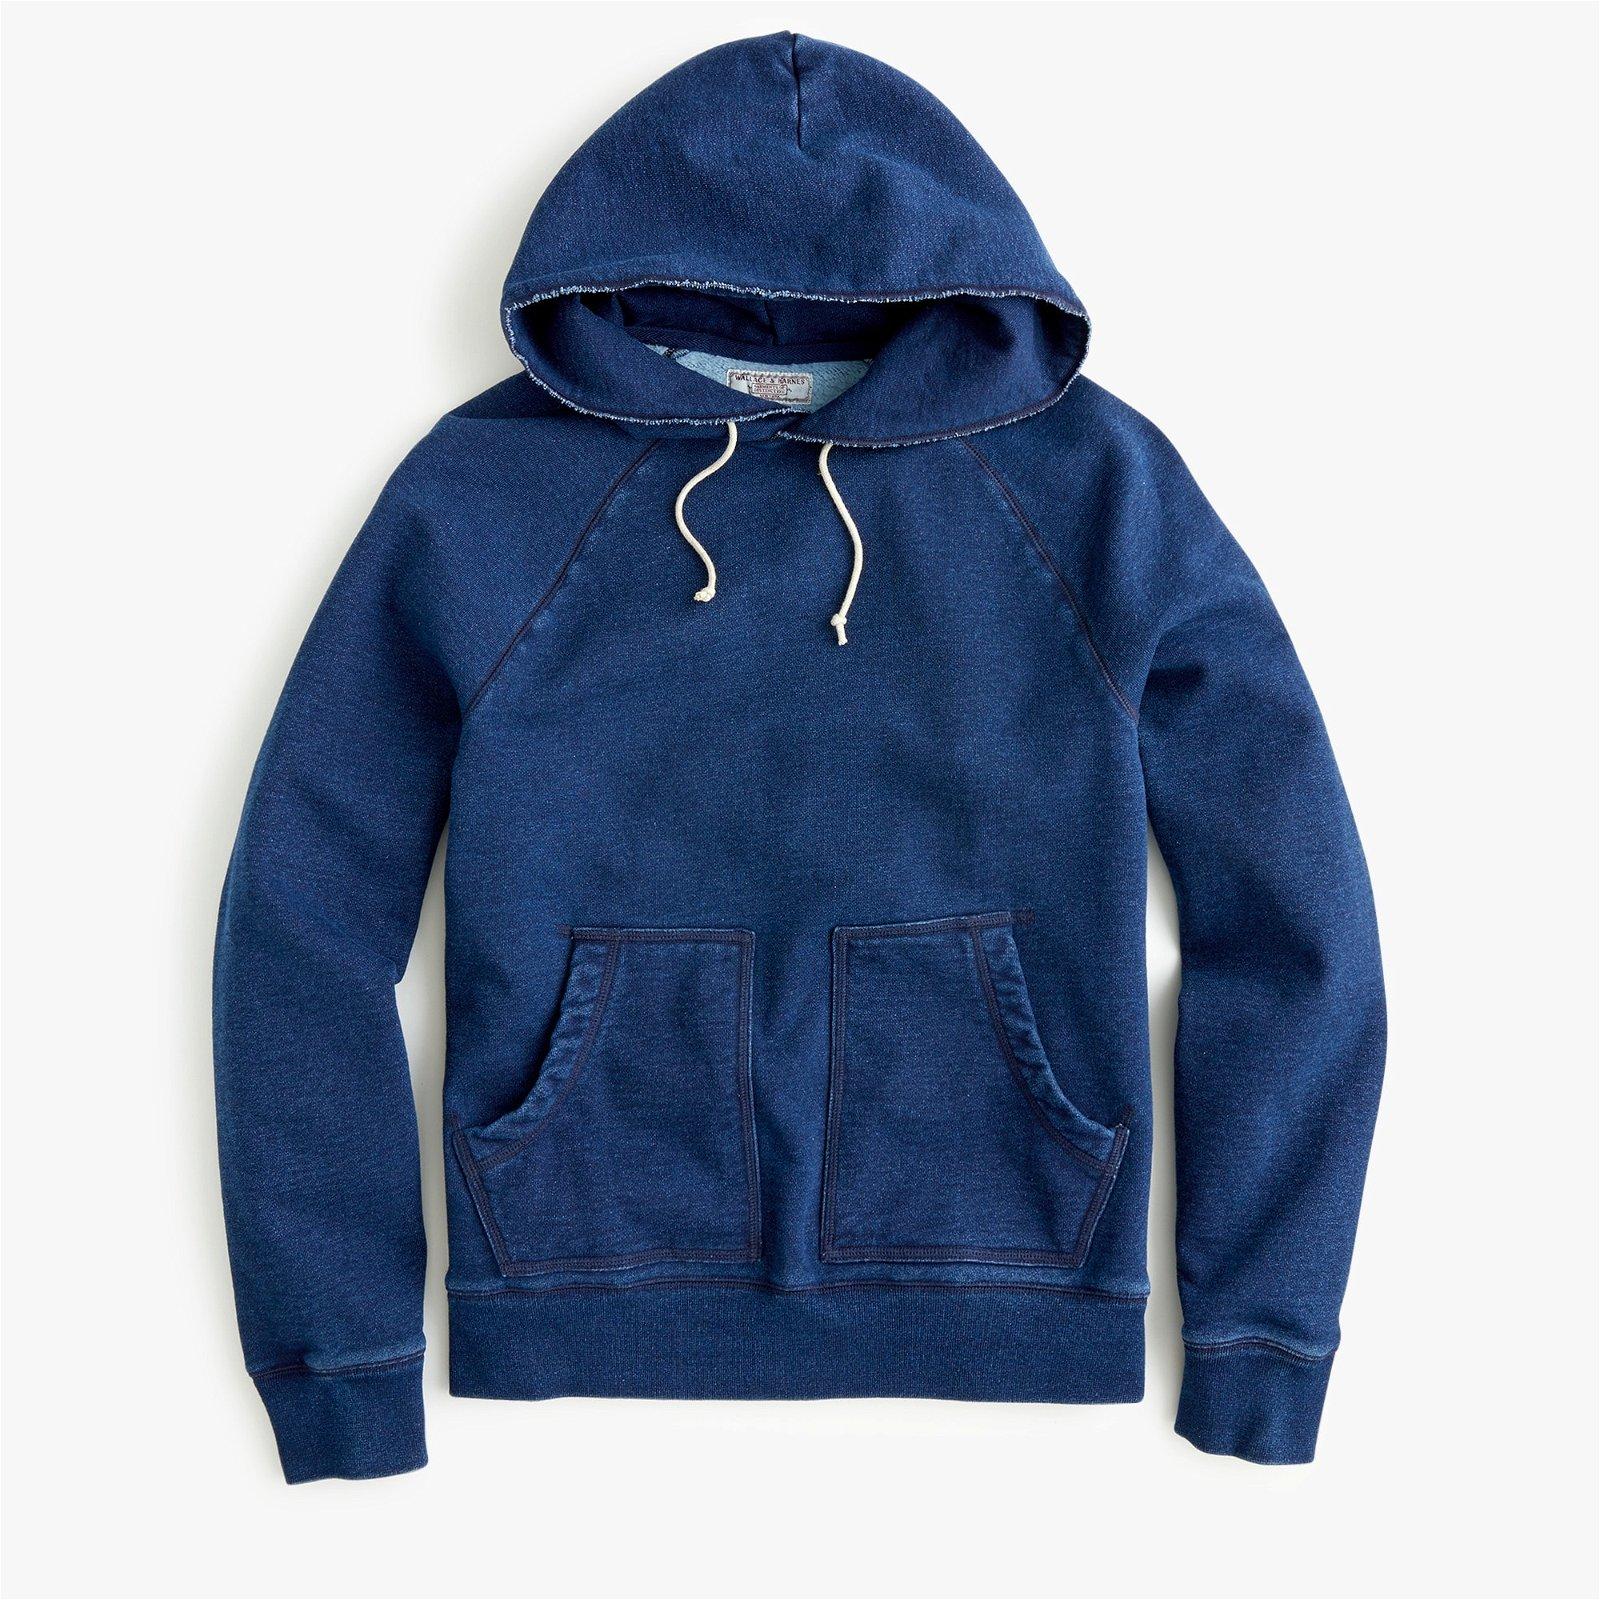 Wallace & Barnes fleece hoodie in indigo wash